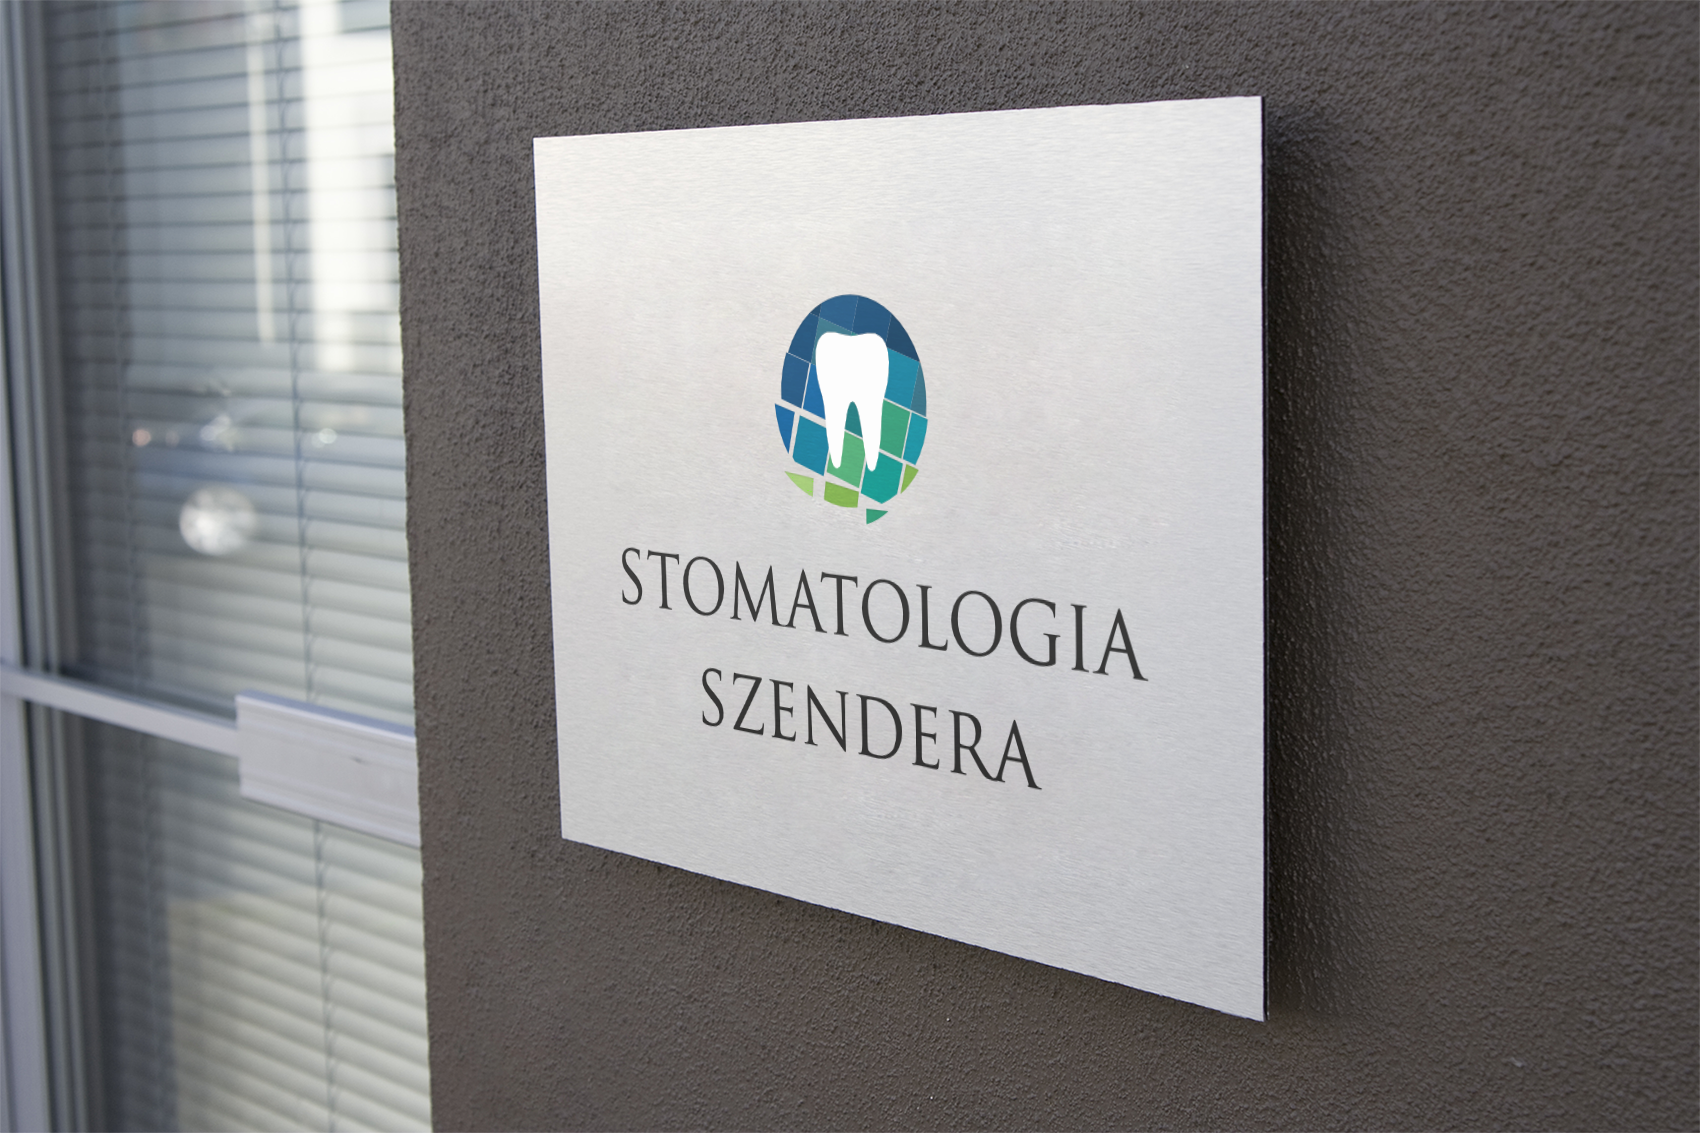 Stomatologia Szendera